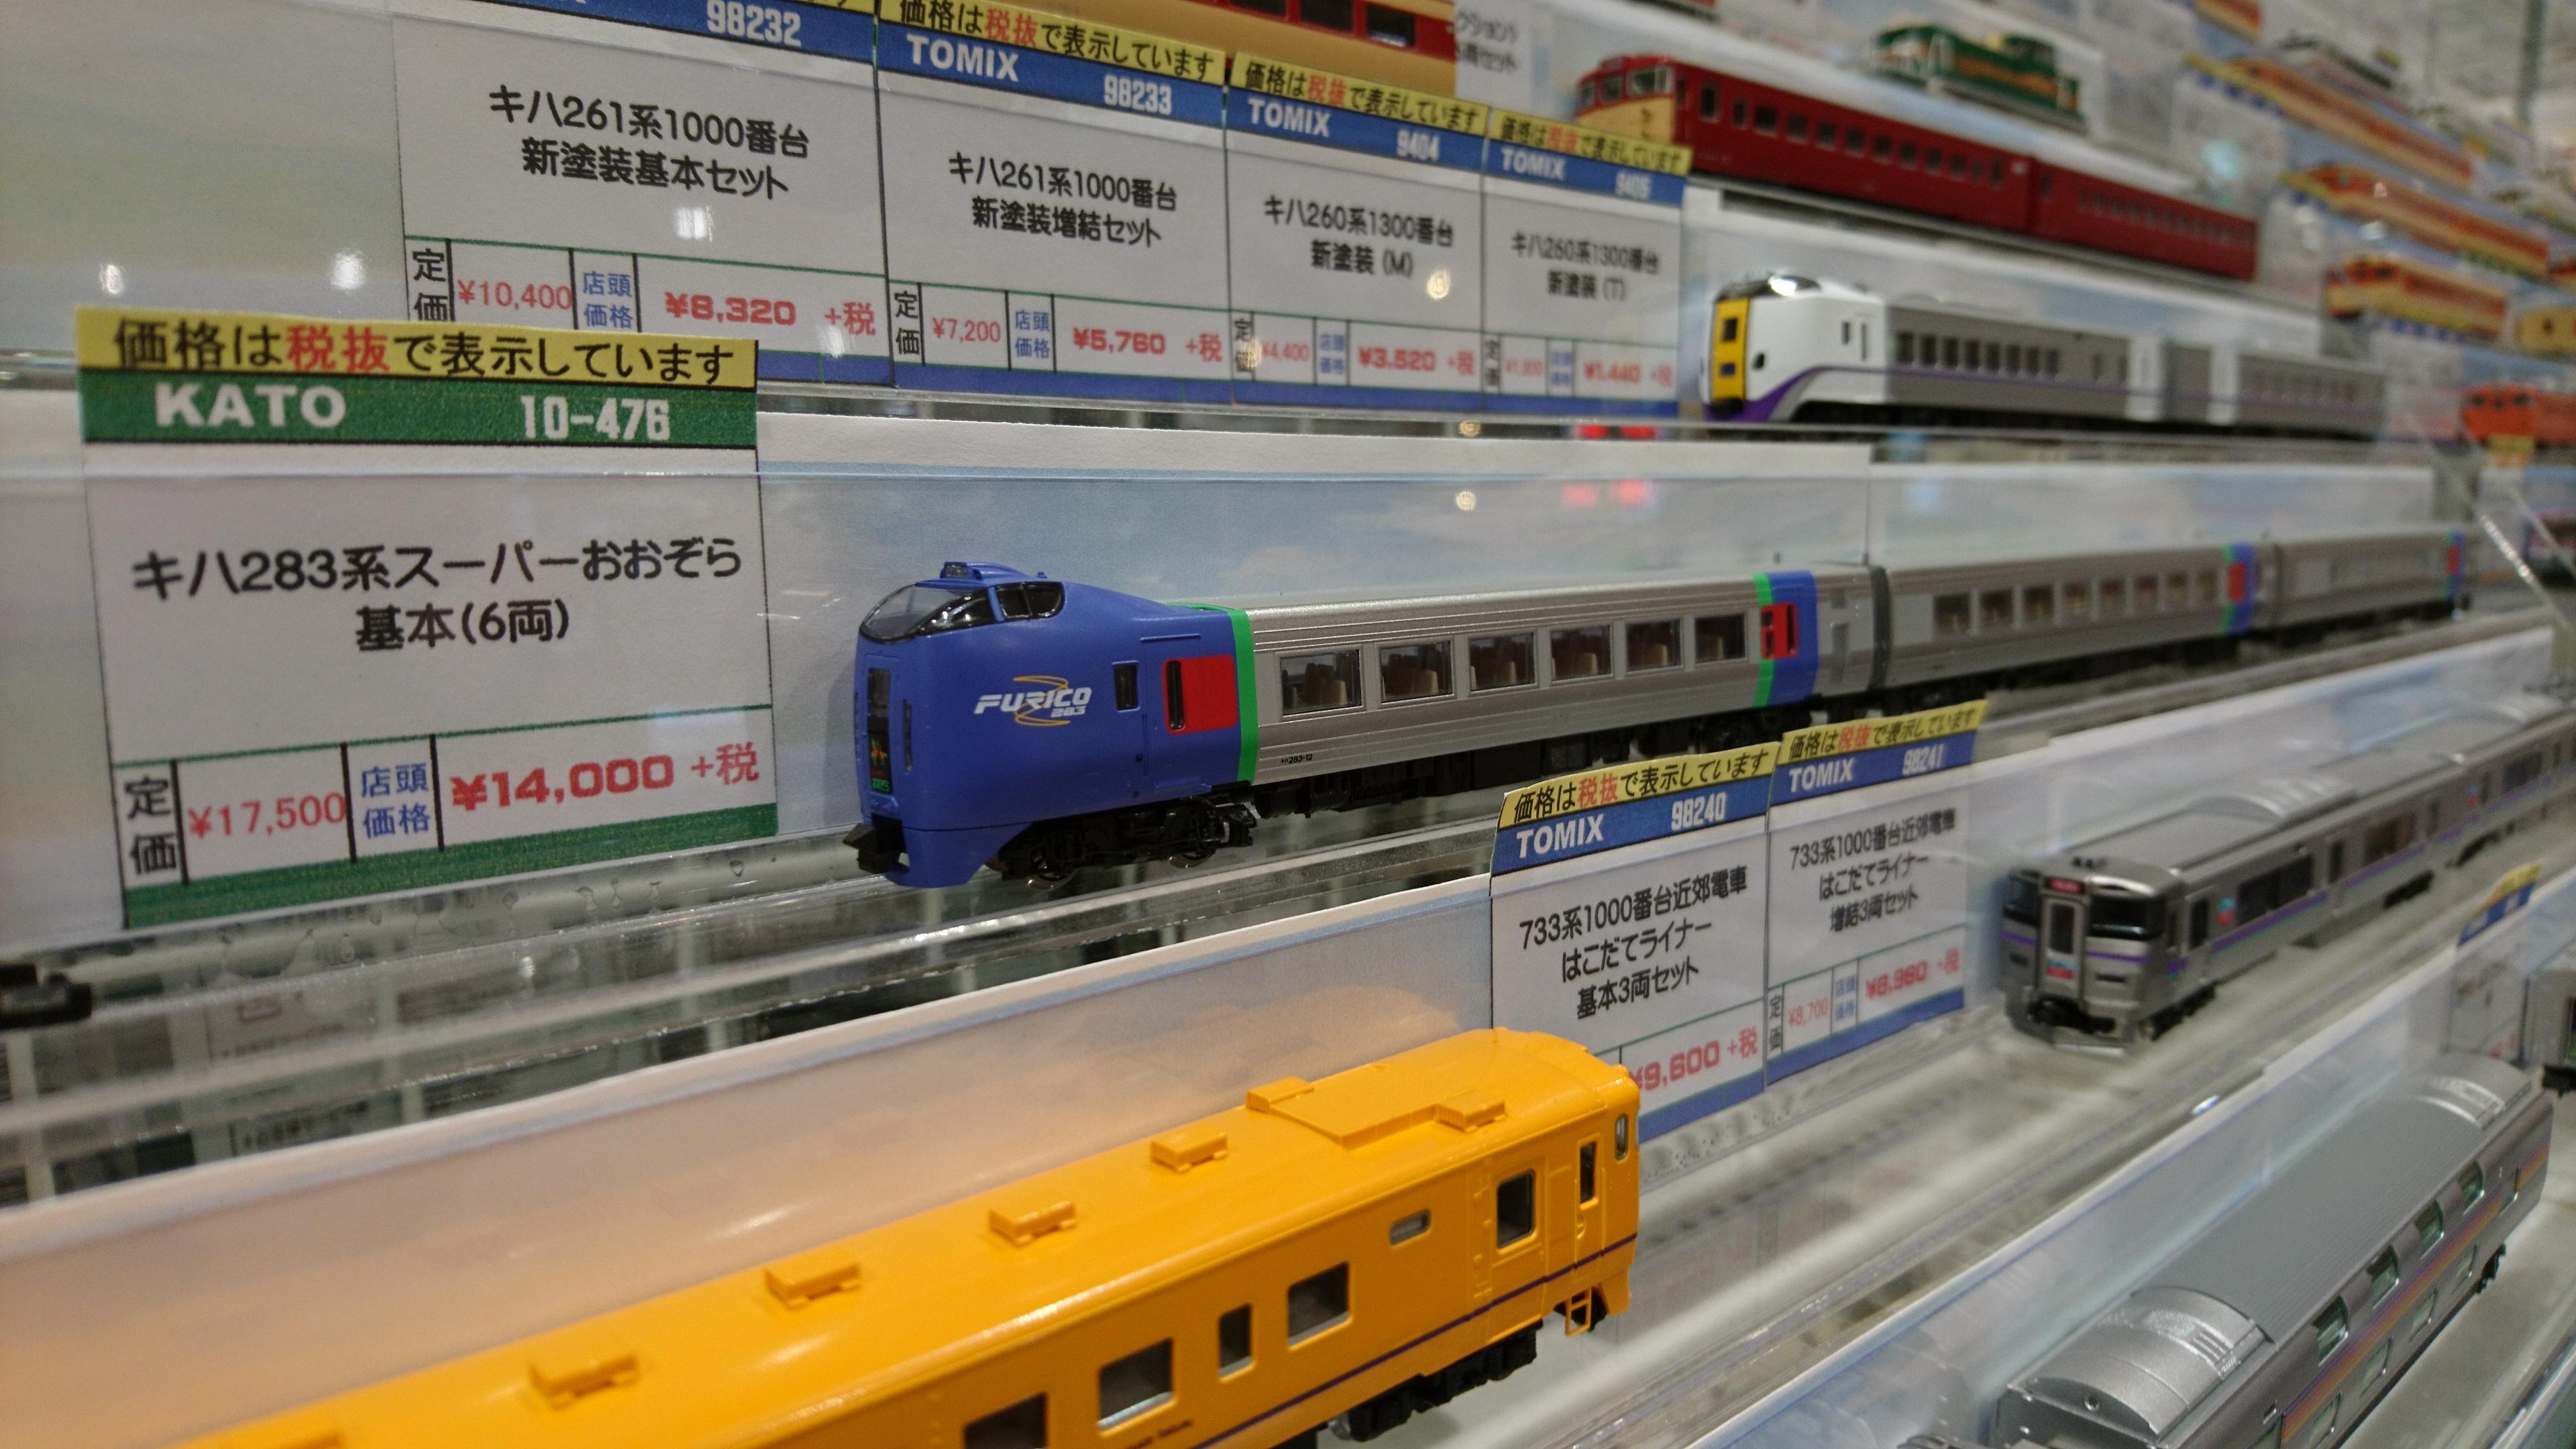 http://popondetta.com/blog_hiroshimafutyu/dc283ki.JPG